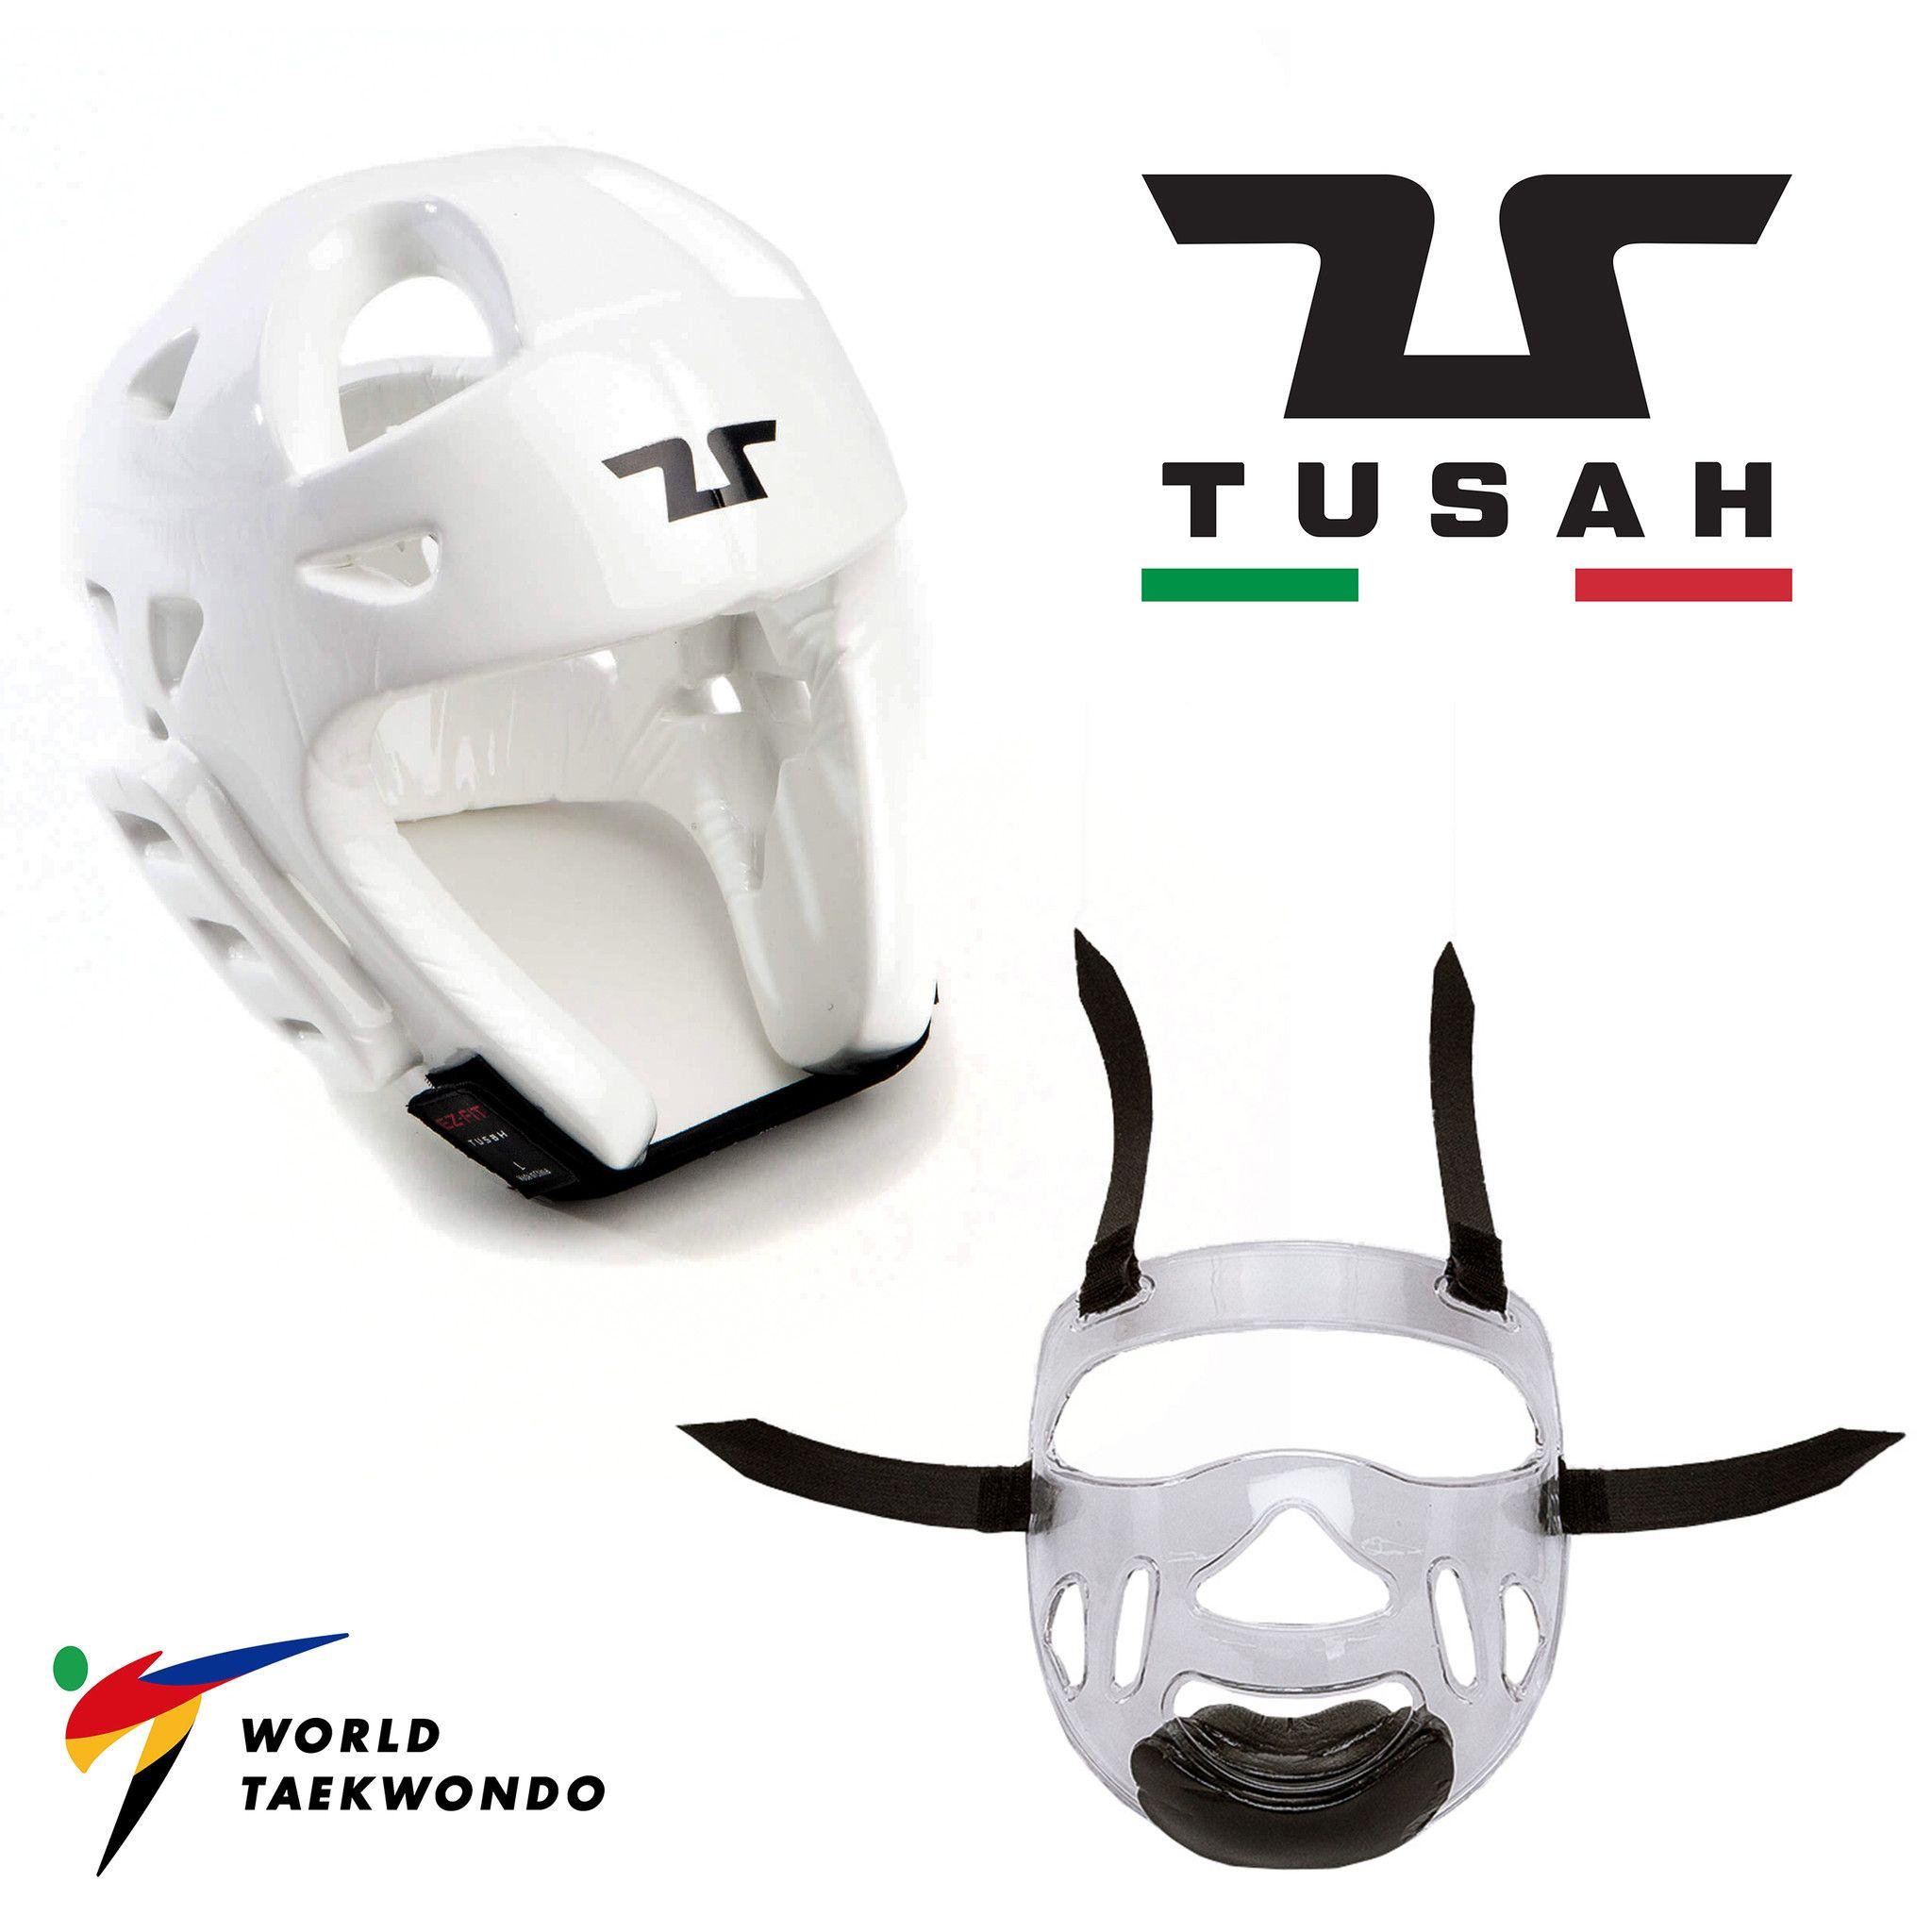 Tusah - Caschetto con Maschera / Visiera Omologata WT